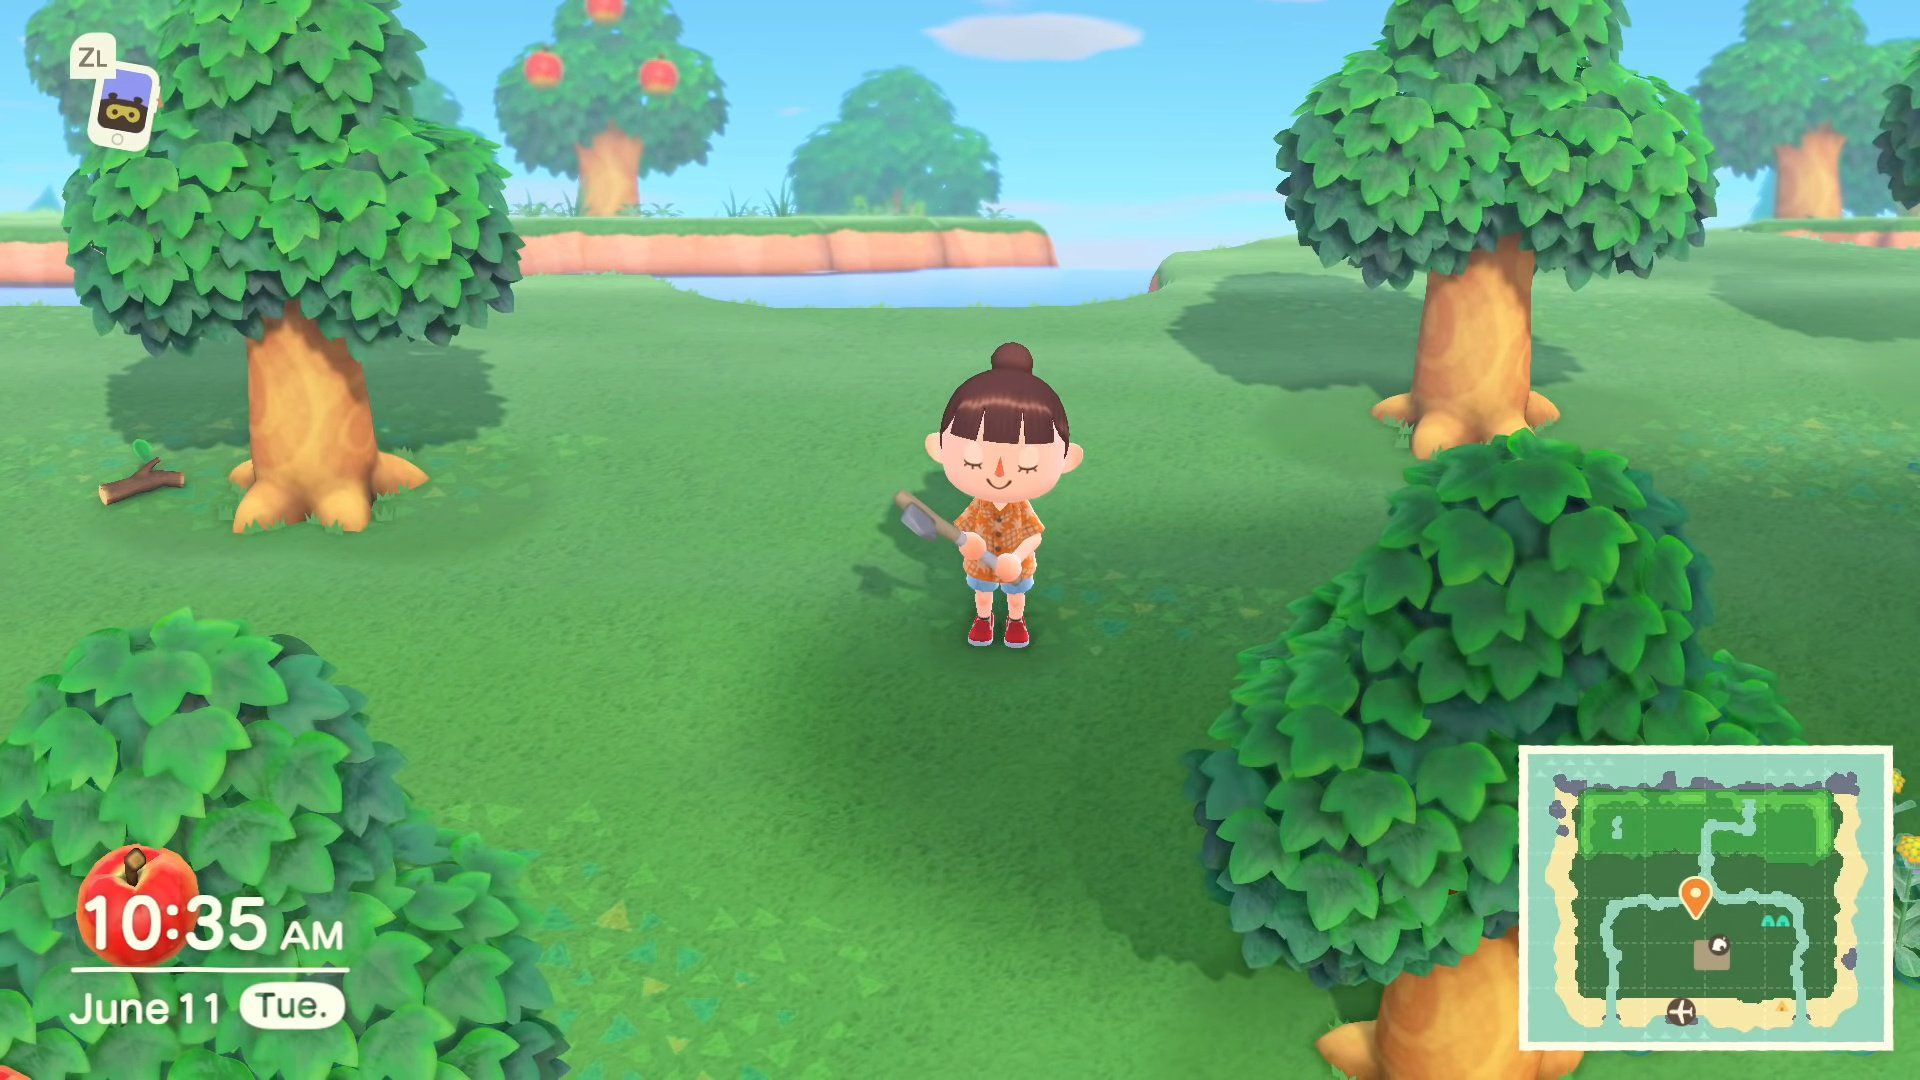 Animal Crossing New Horizons Wallpapers - Top Free Animal ...